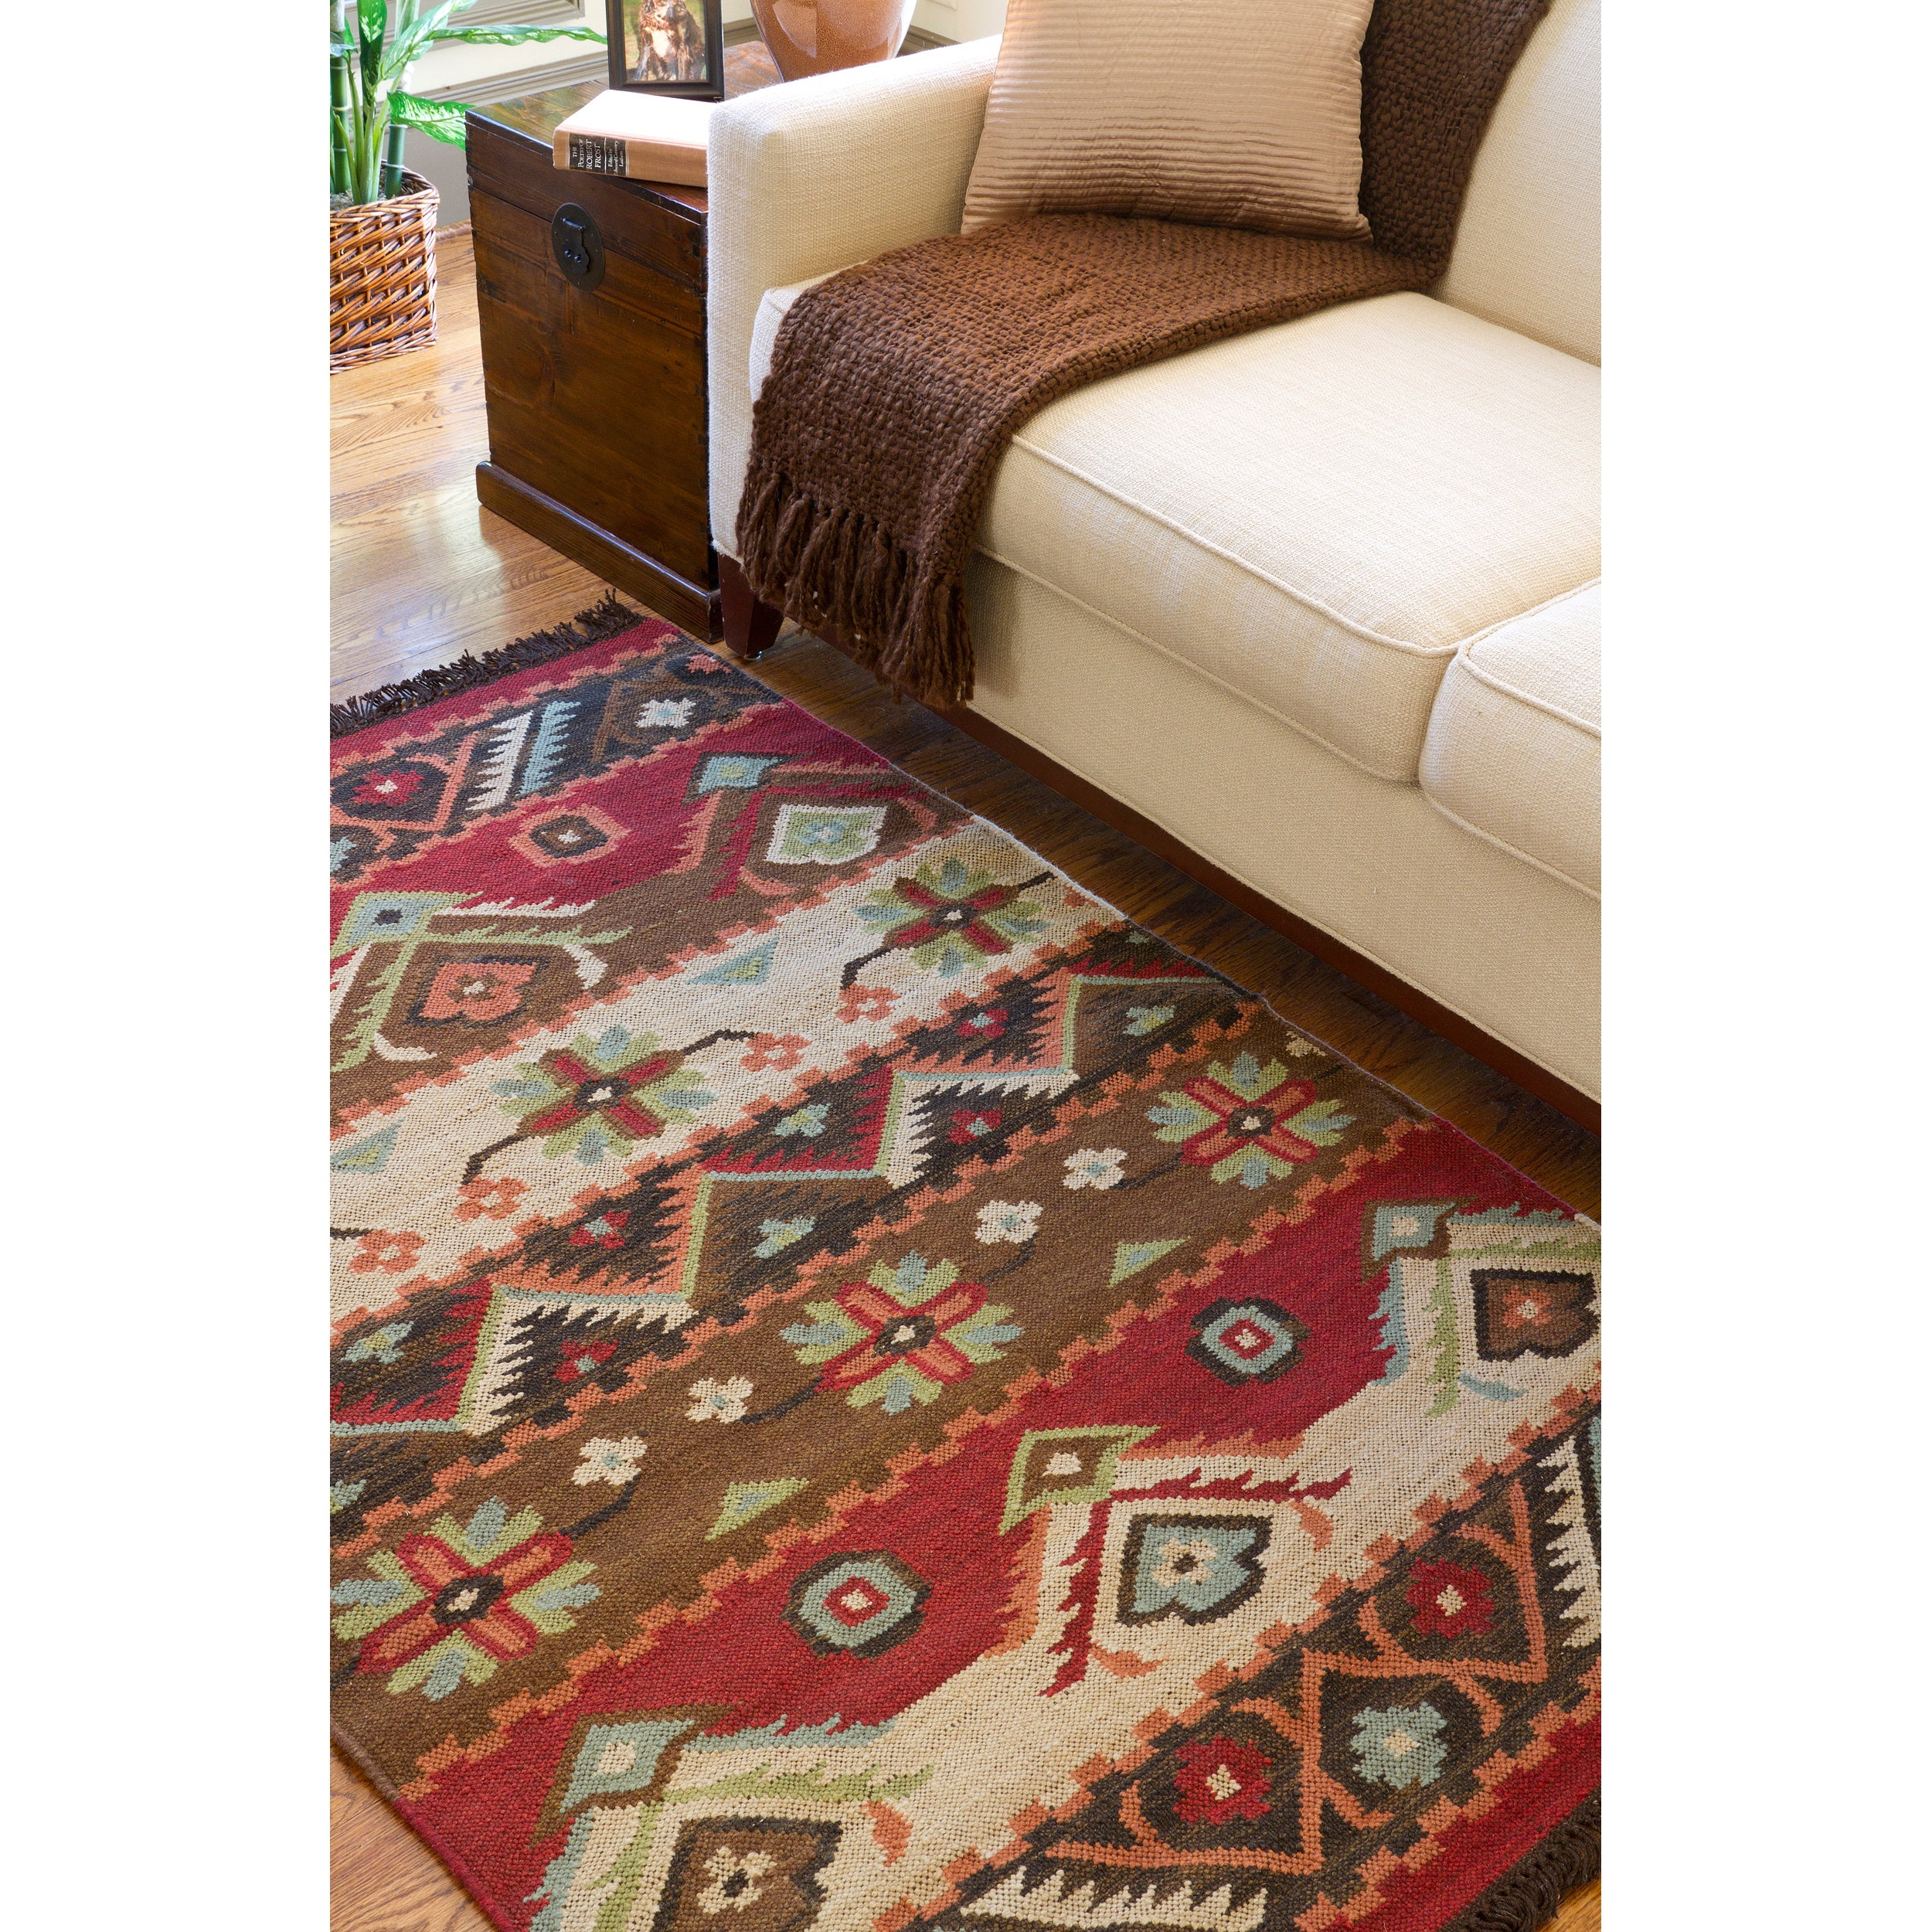 Hand-woven Red/Tan Southwestern Aztec Louise Wool